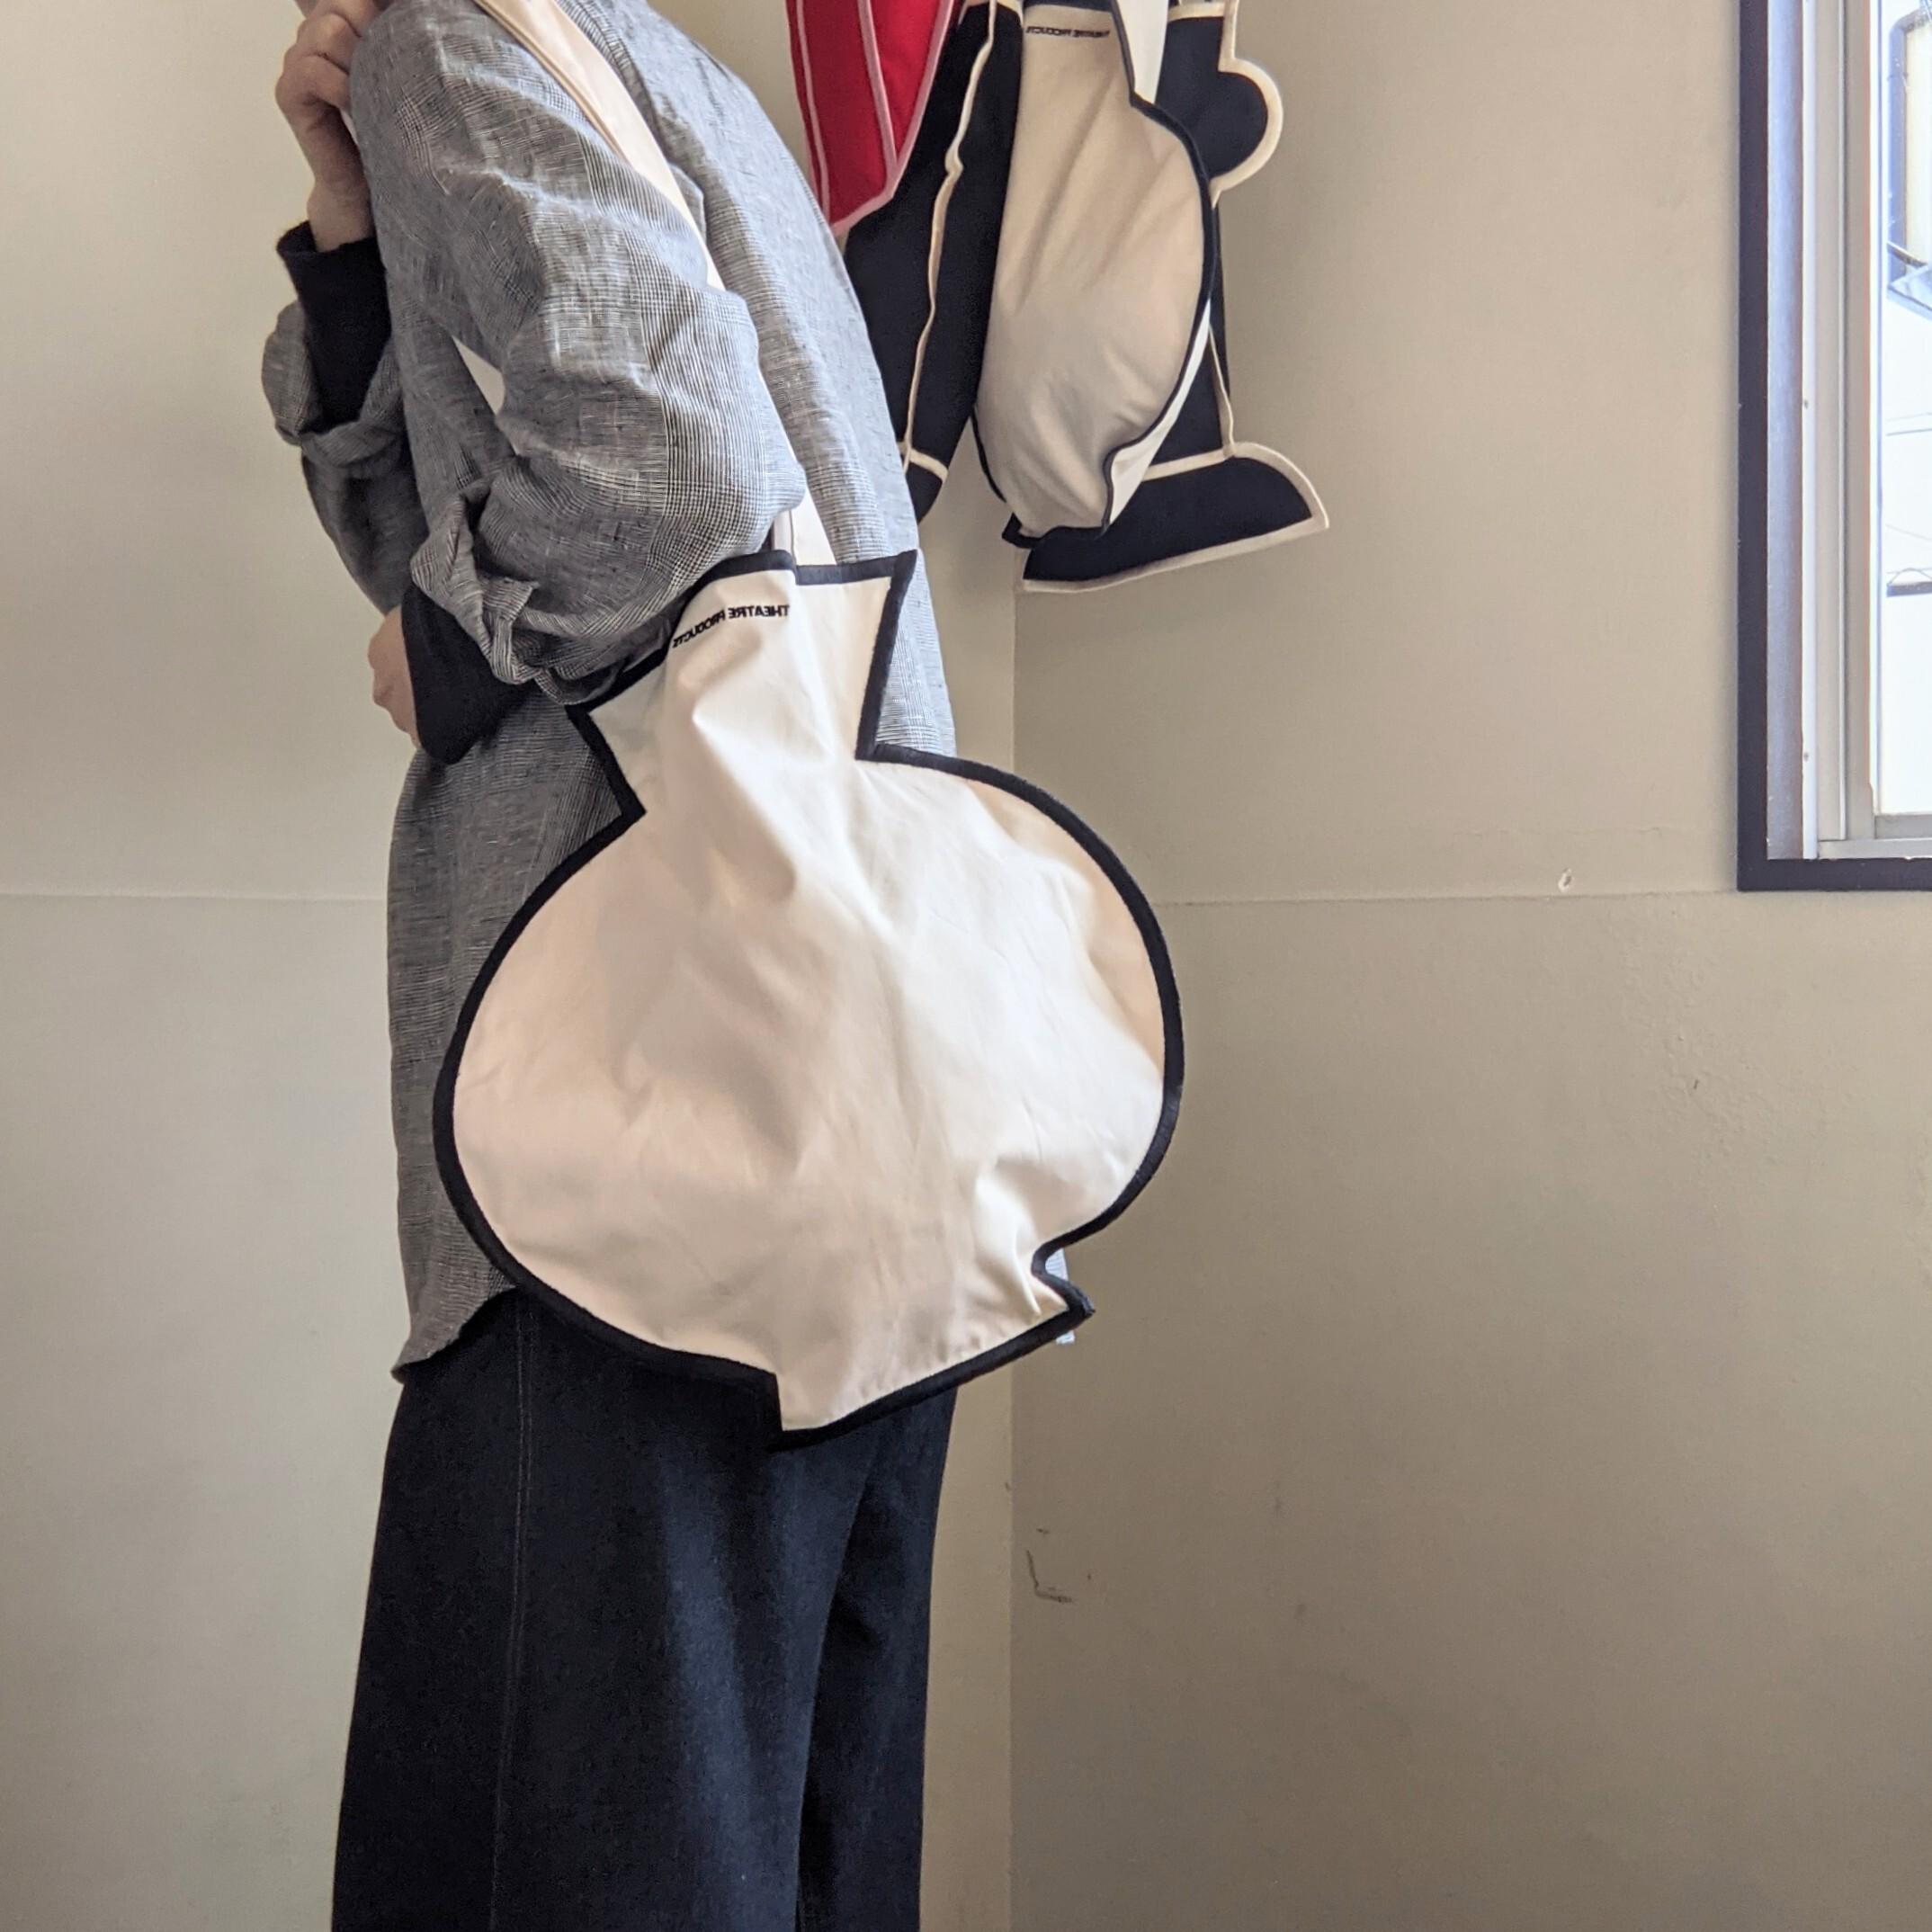 ☆last1☆【 THEATRE PRODUCTS 】シアタープロダクツ / flowerbase shoulderbag / ショルダーバッグ / ivory